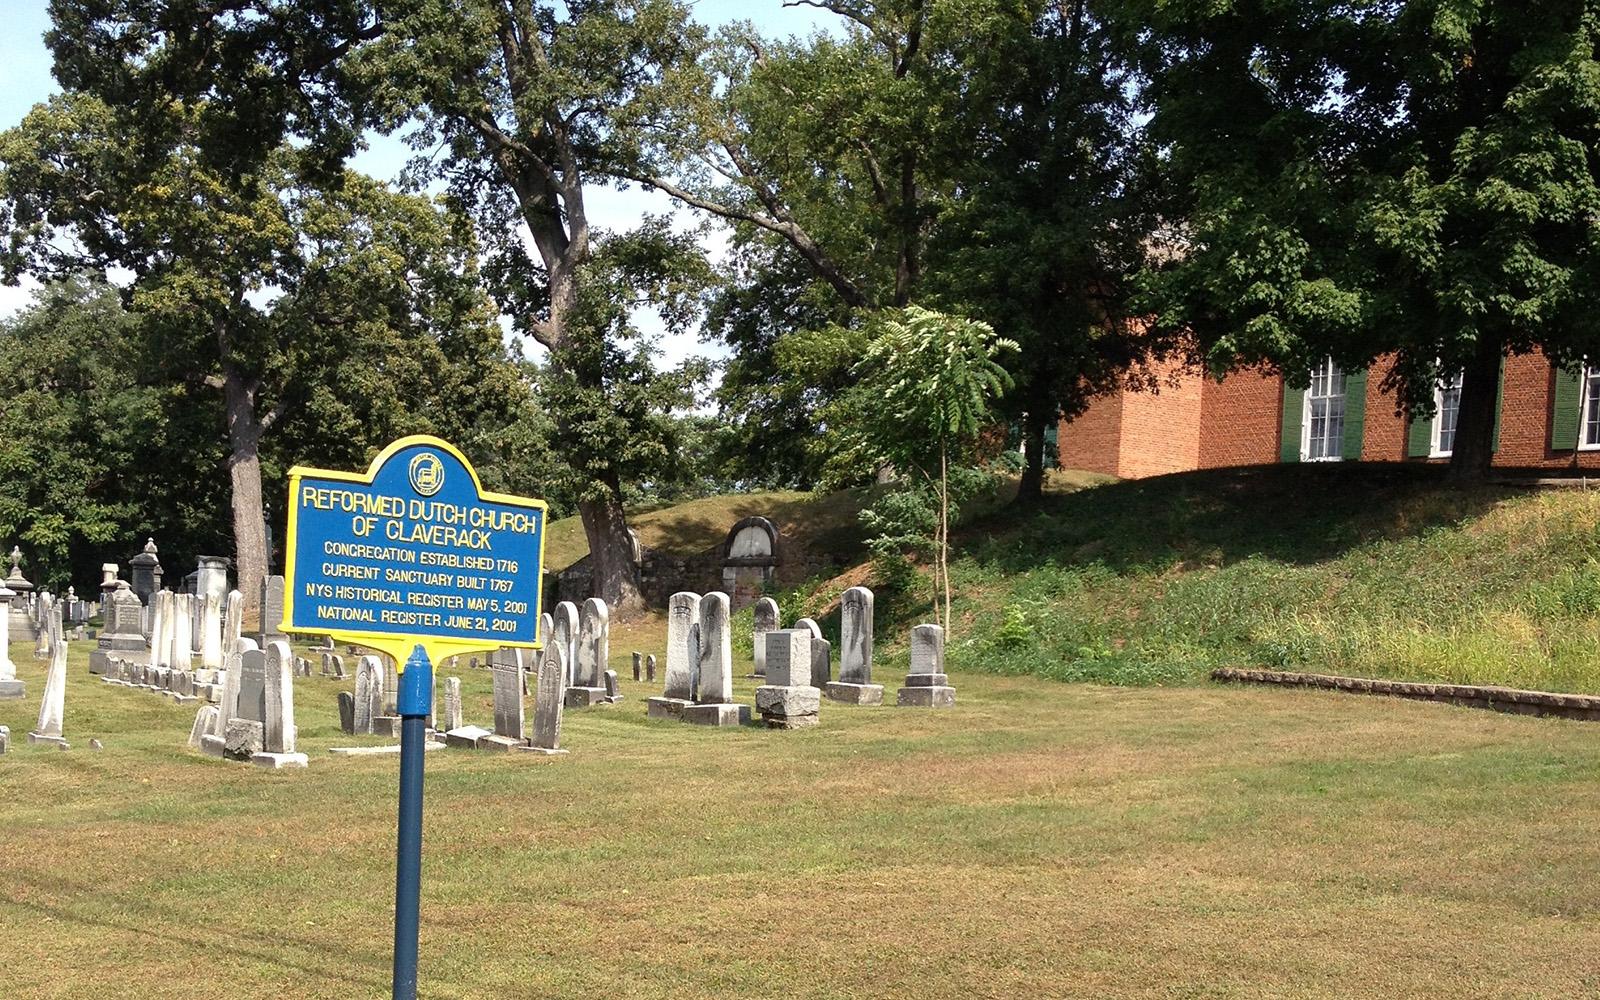 The Reformed Dutch Church in Claverack cemetery